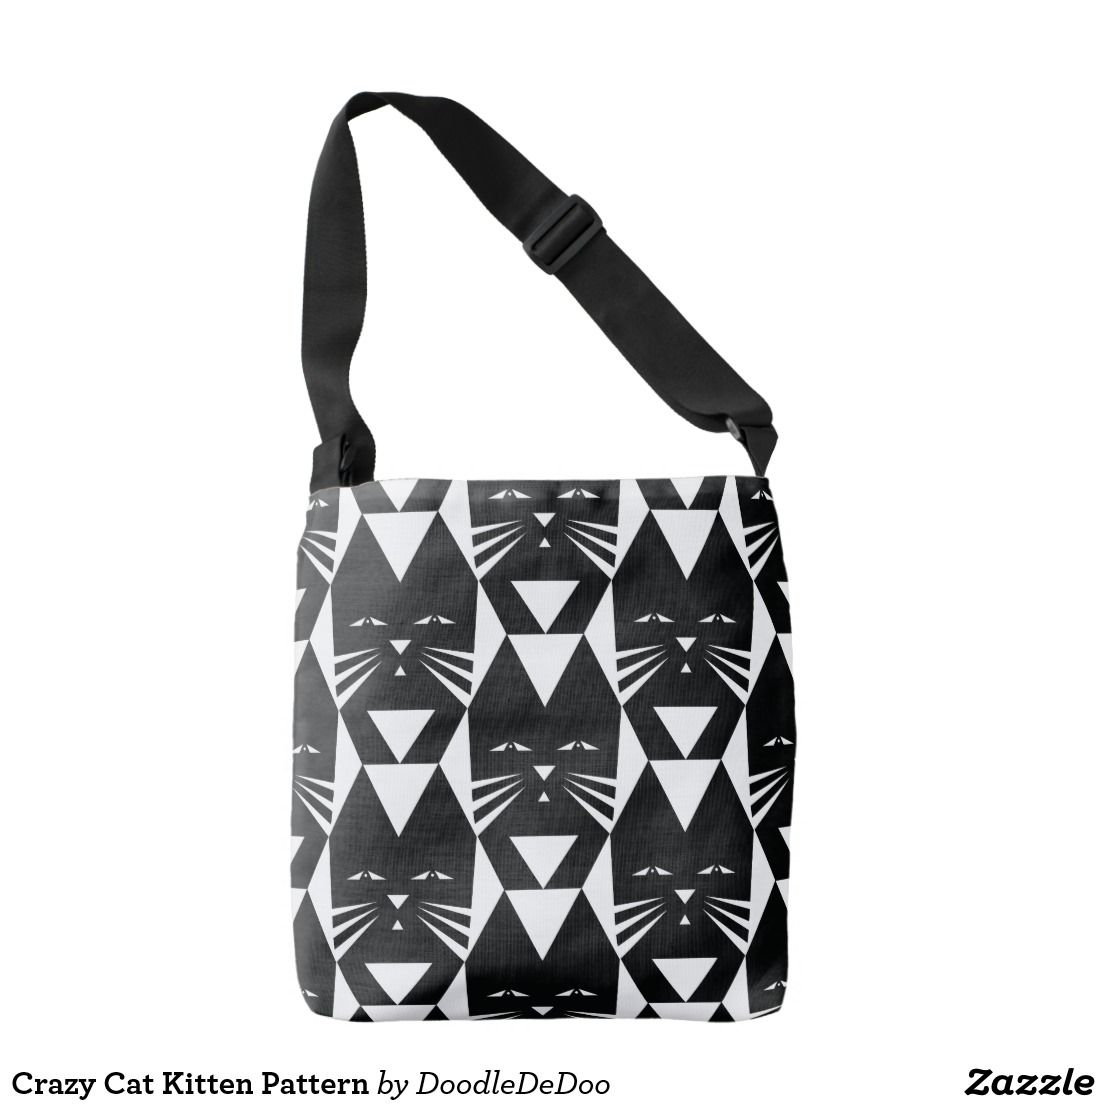 Crazy Cat Kitten Pattern Crossbody Bag Zazzle Com Crazy Cats Cats And Kittens Kitten